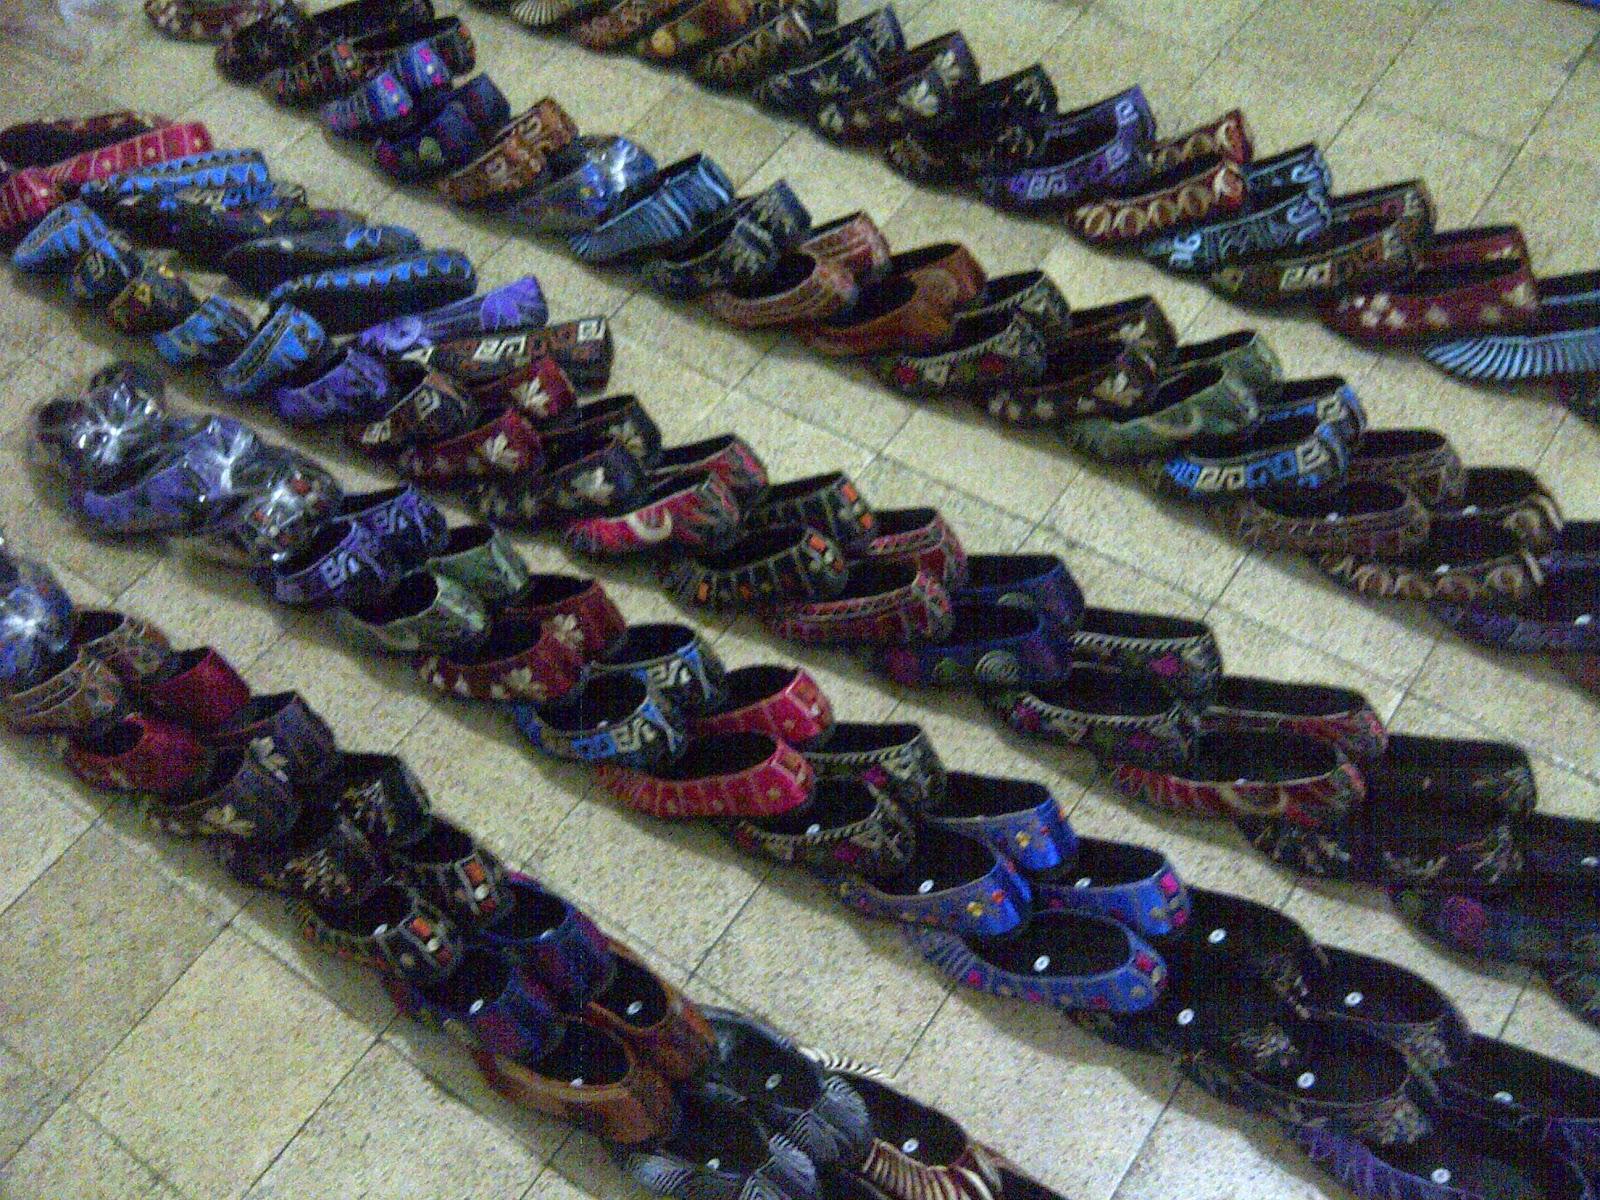 Model Sepatu Wanita Terkini, Koleksi Sepatu Wanita Terbaru, Koleksi Sepatu Wanita Branded, www.distributorsepatumurah.com